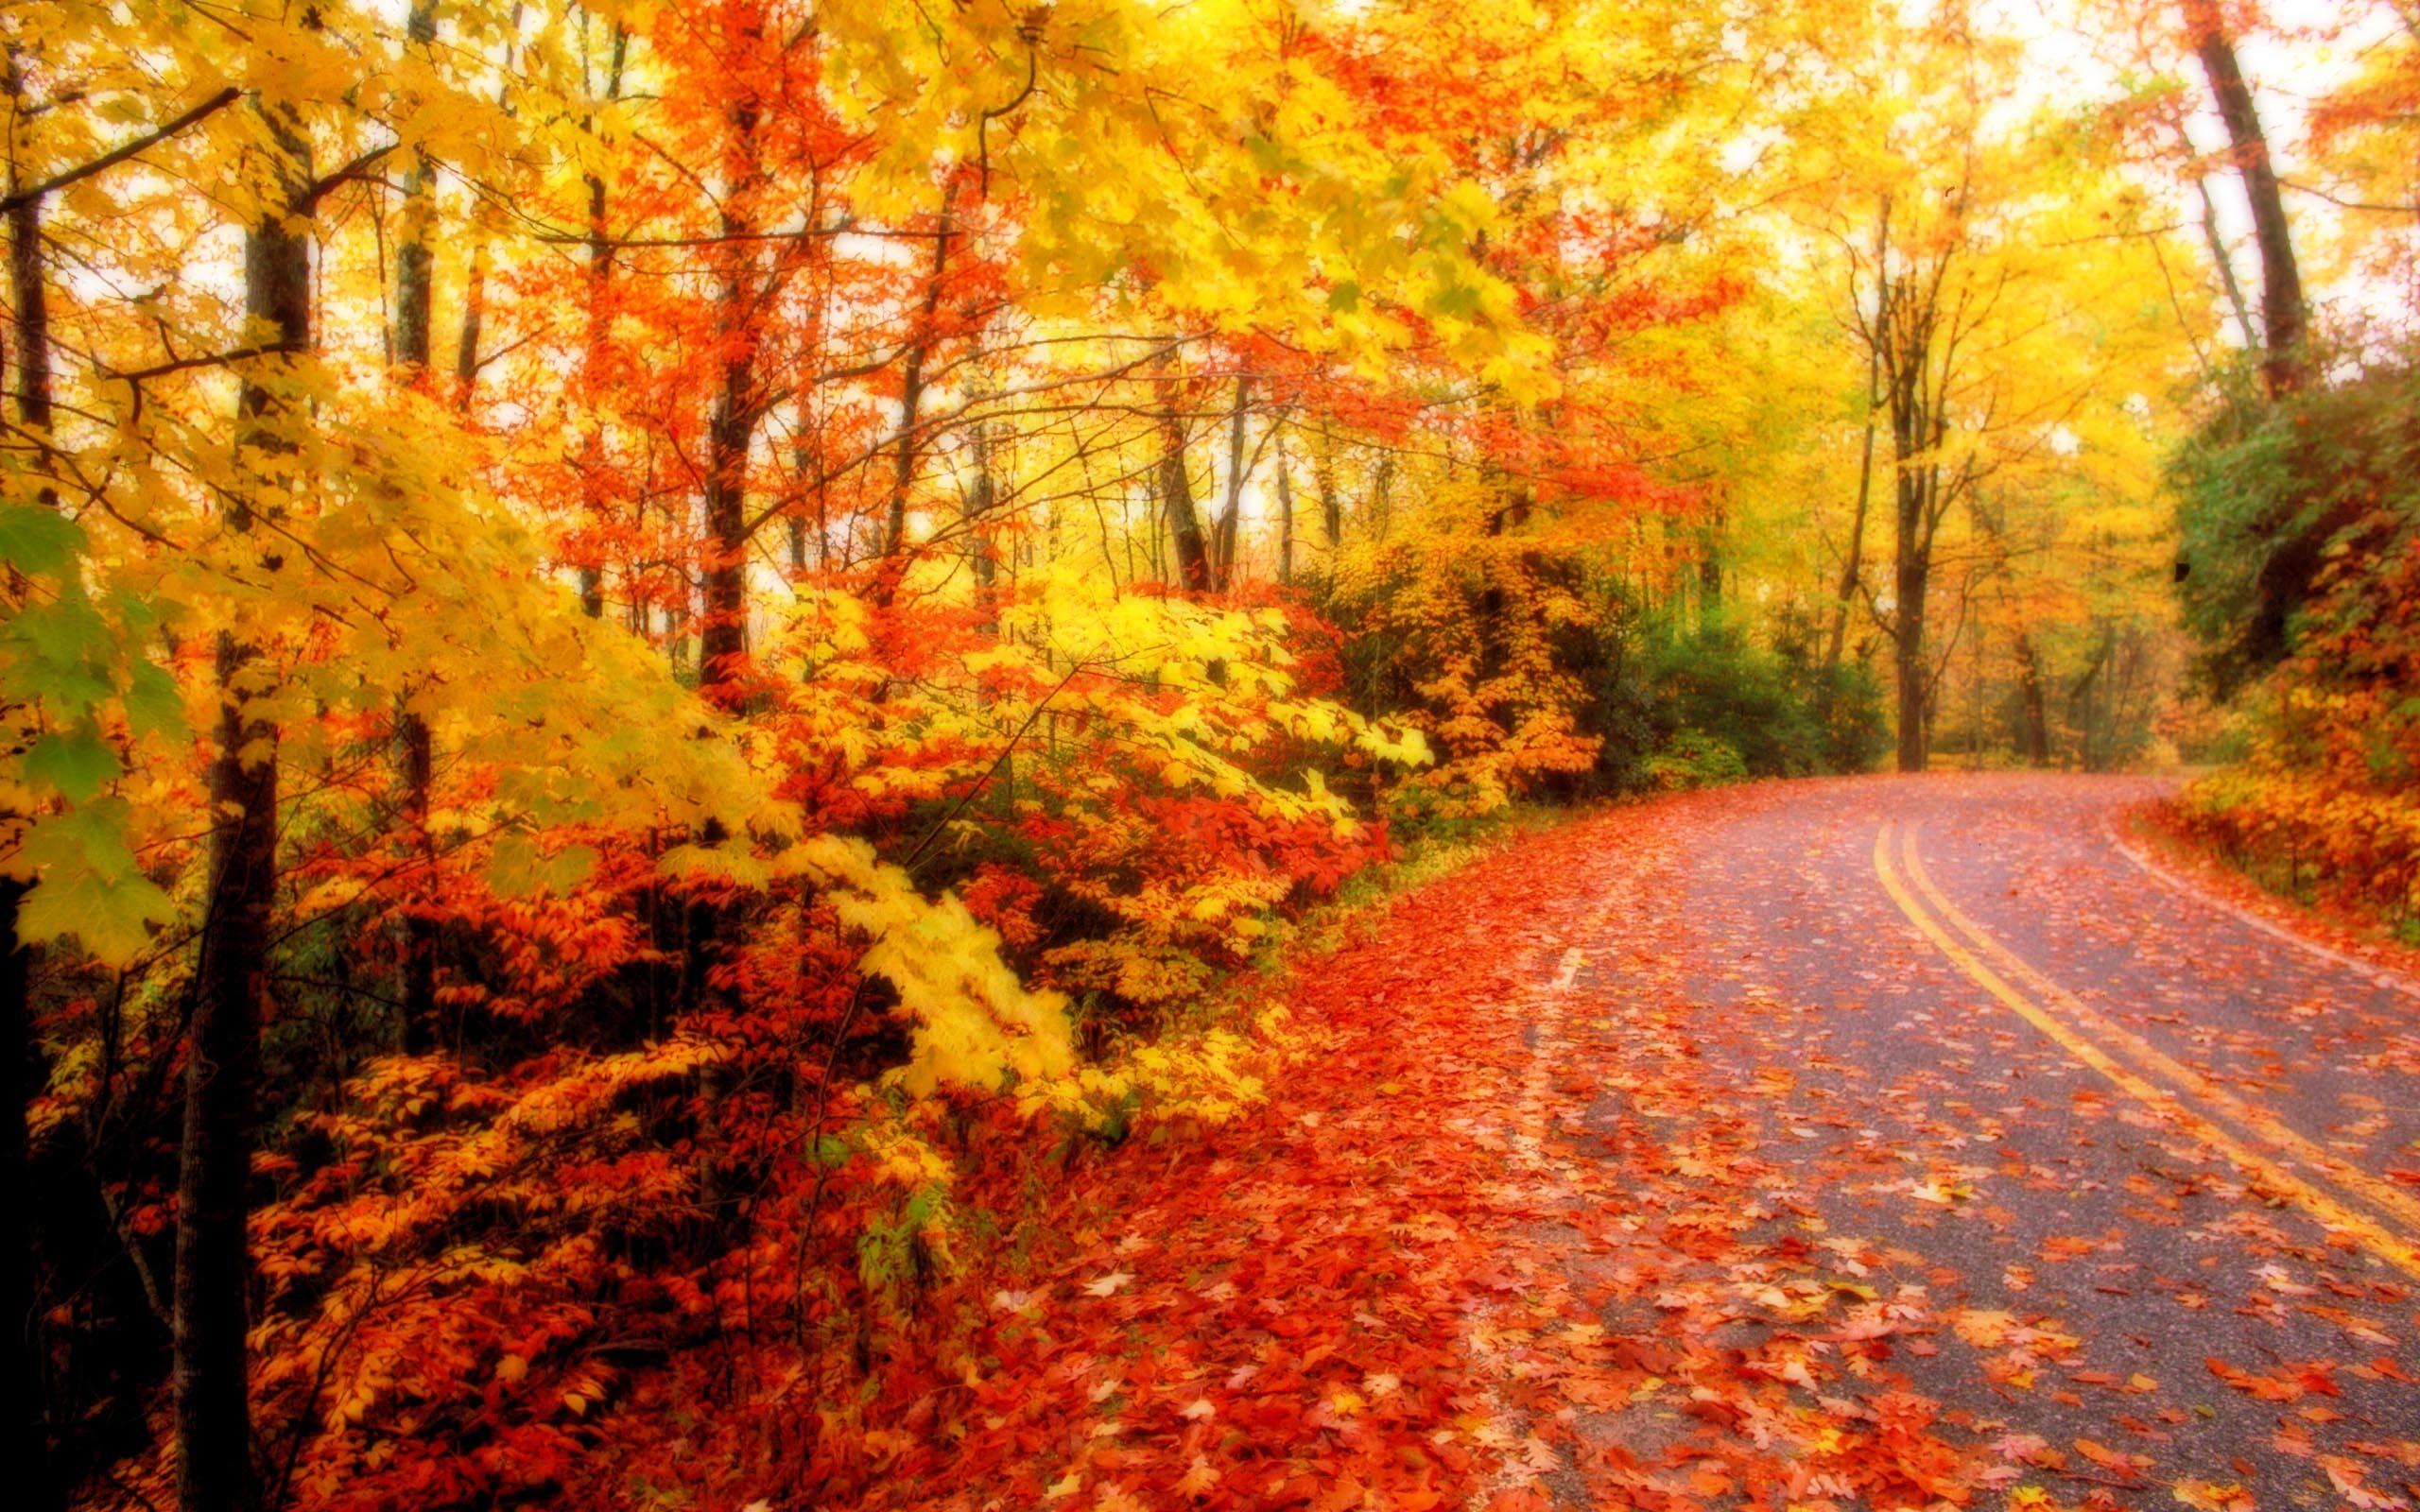 Great minds discuss ideas » latest autumn season wallpapers 2013-2014 .